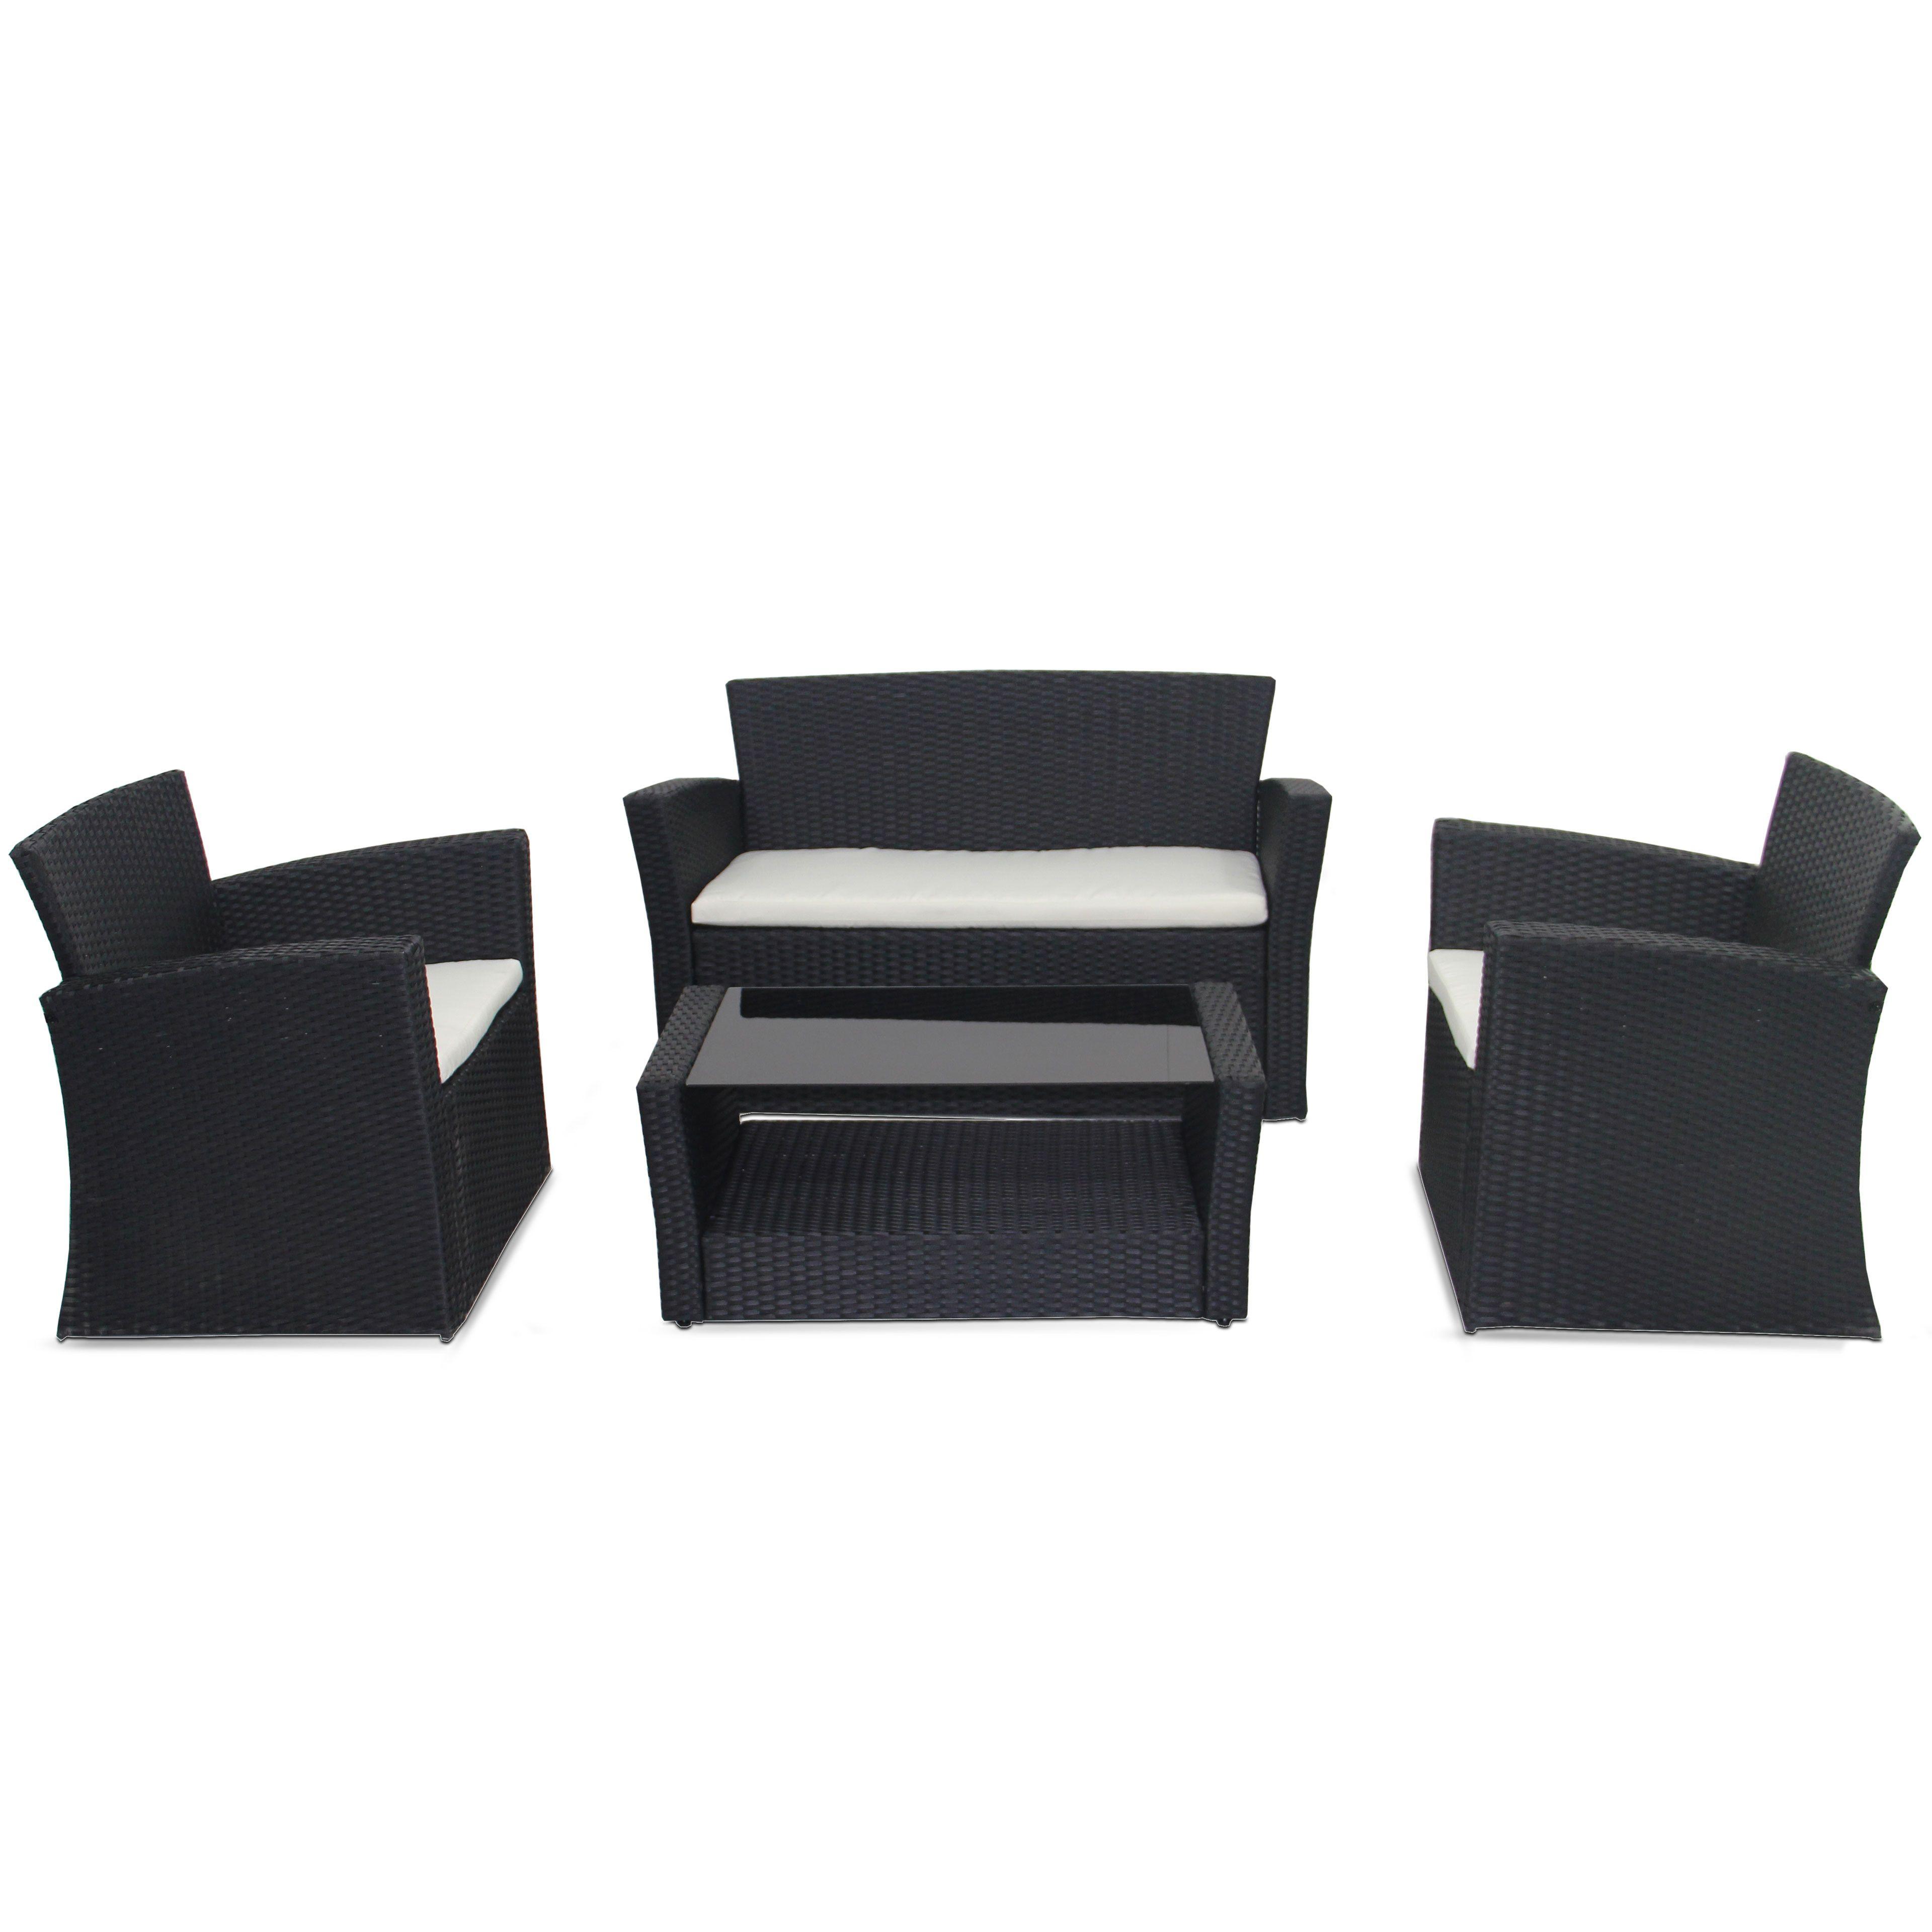 salon de jardin 4 places en r sine. Black Bedroom Furniture Sets. Home Design Ideas